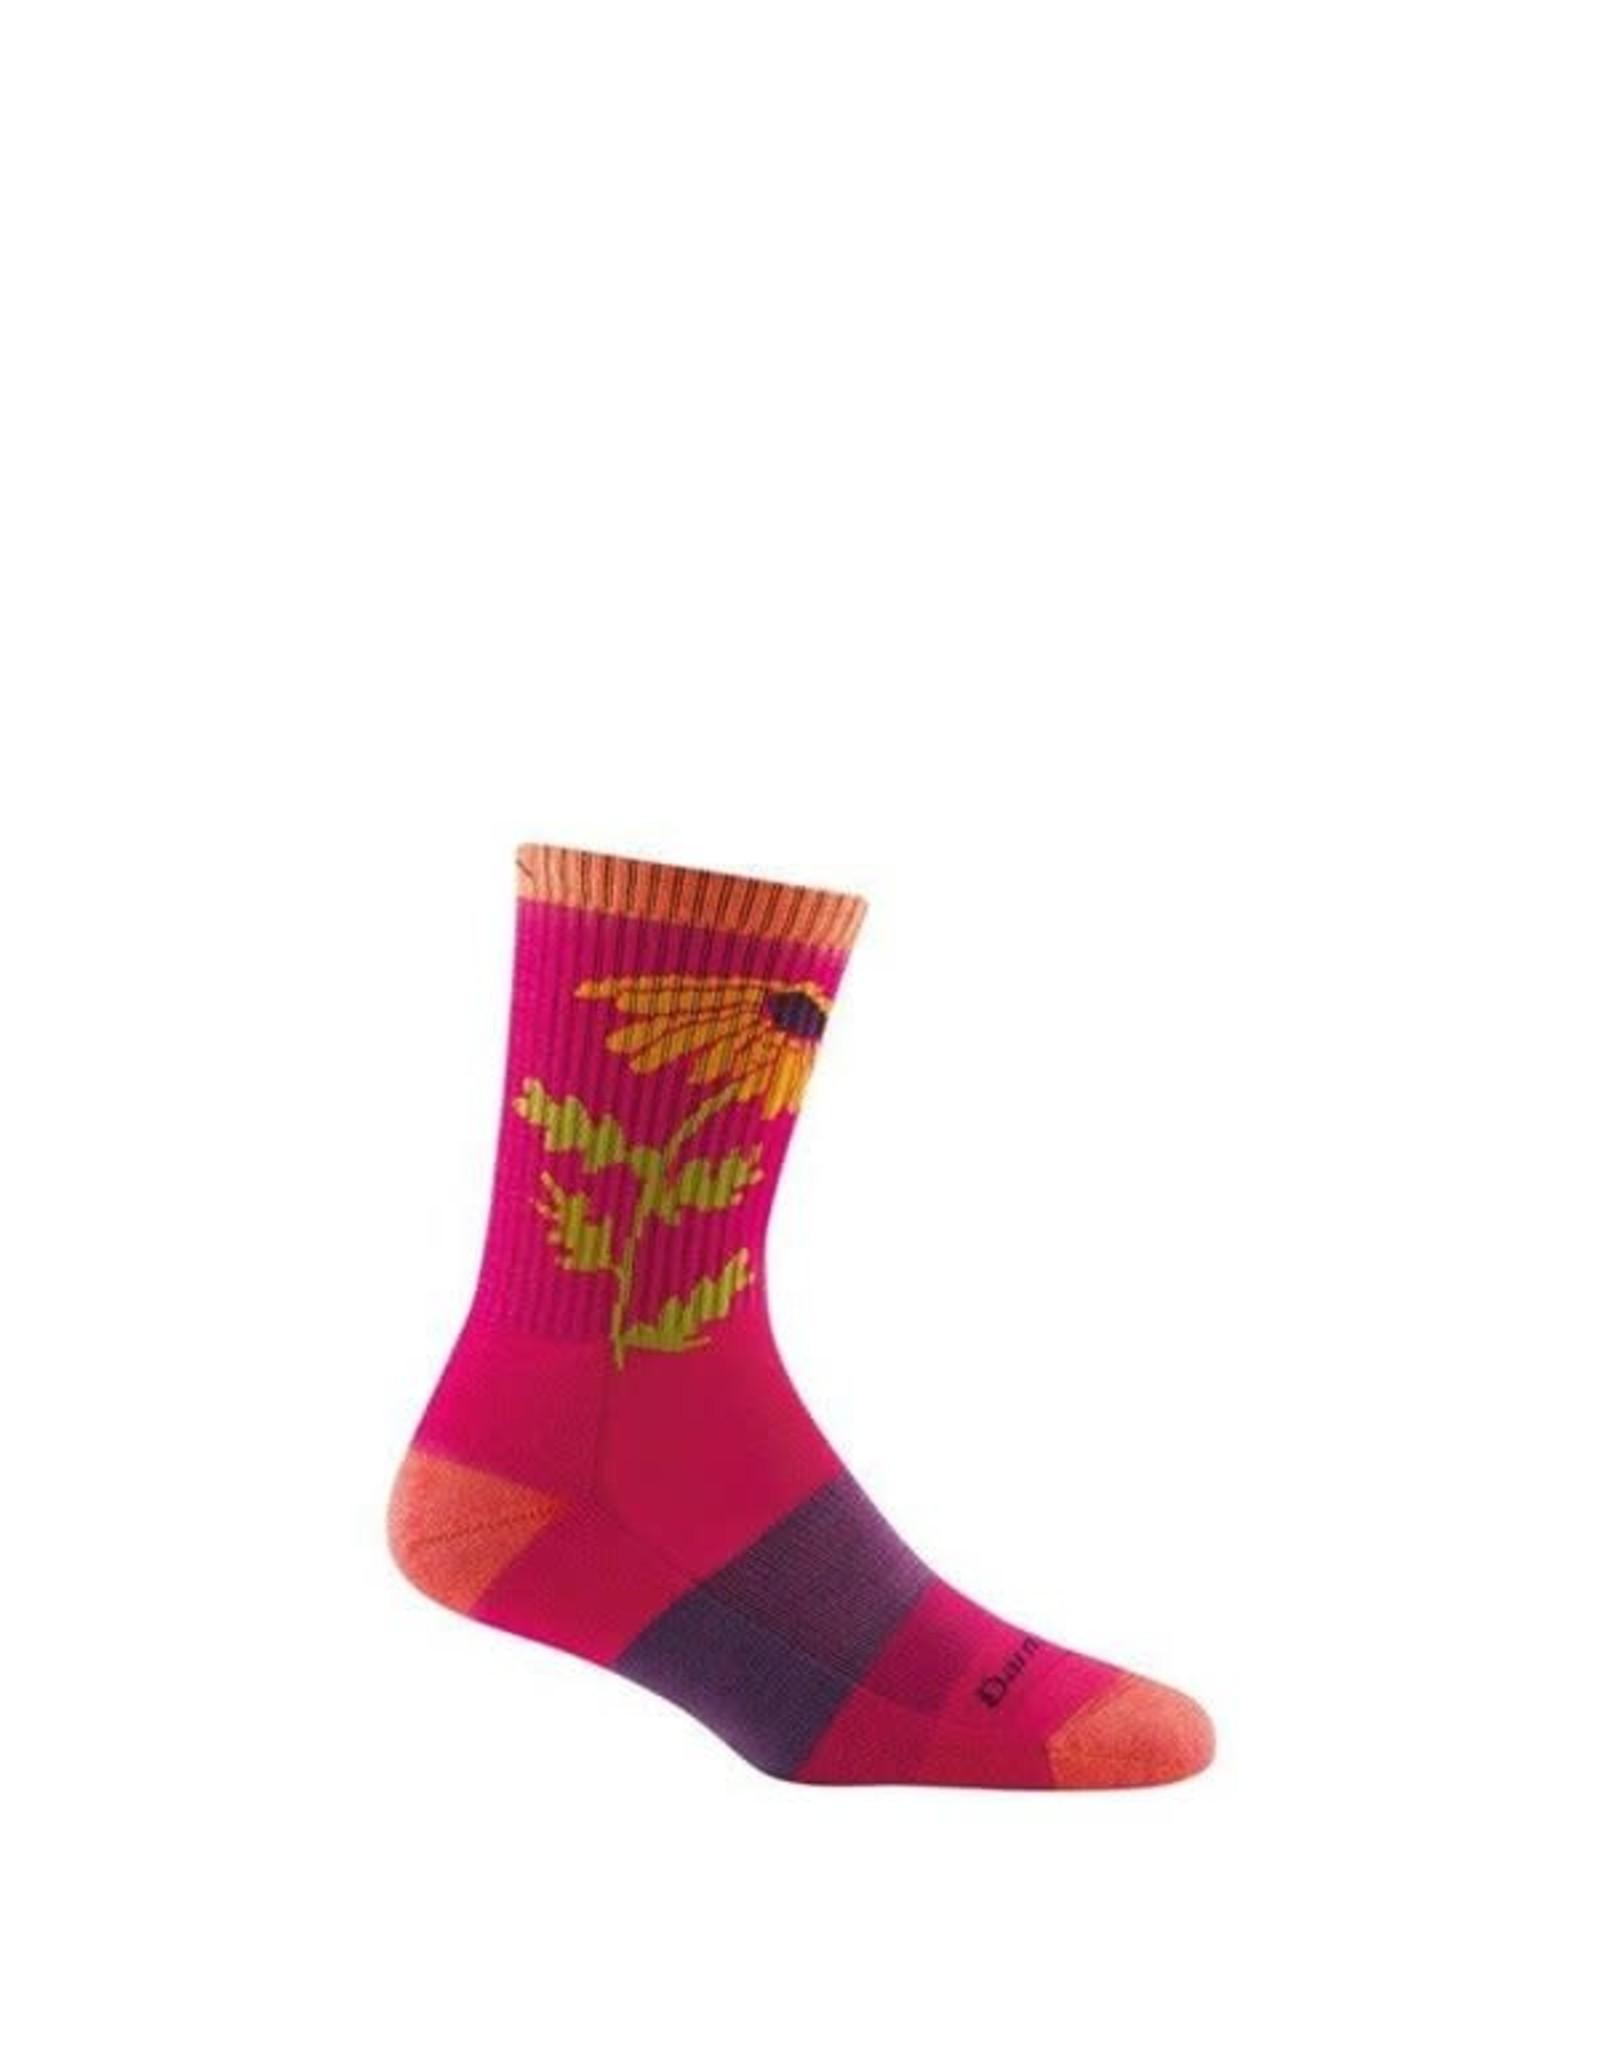 Darn Tough Darn Tough Women's Queen Bee Micro Crew Lightweight Cushion Sock